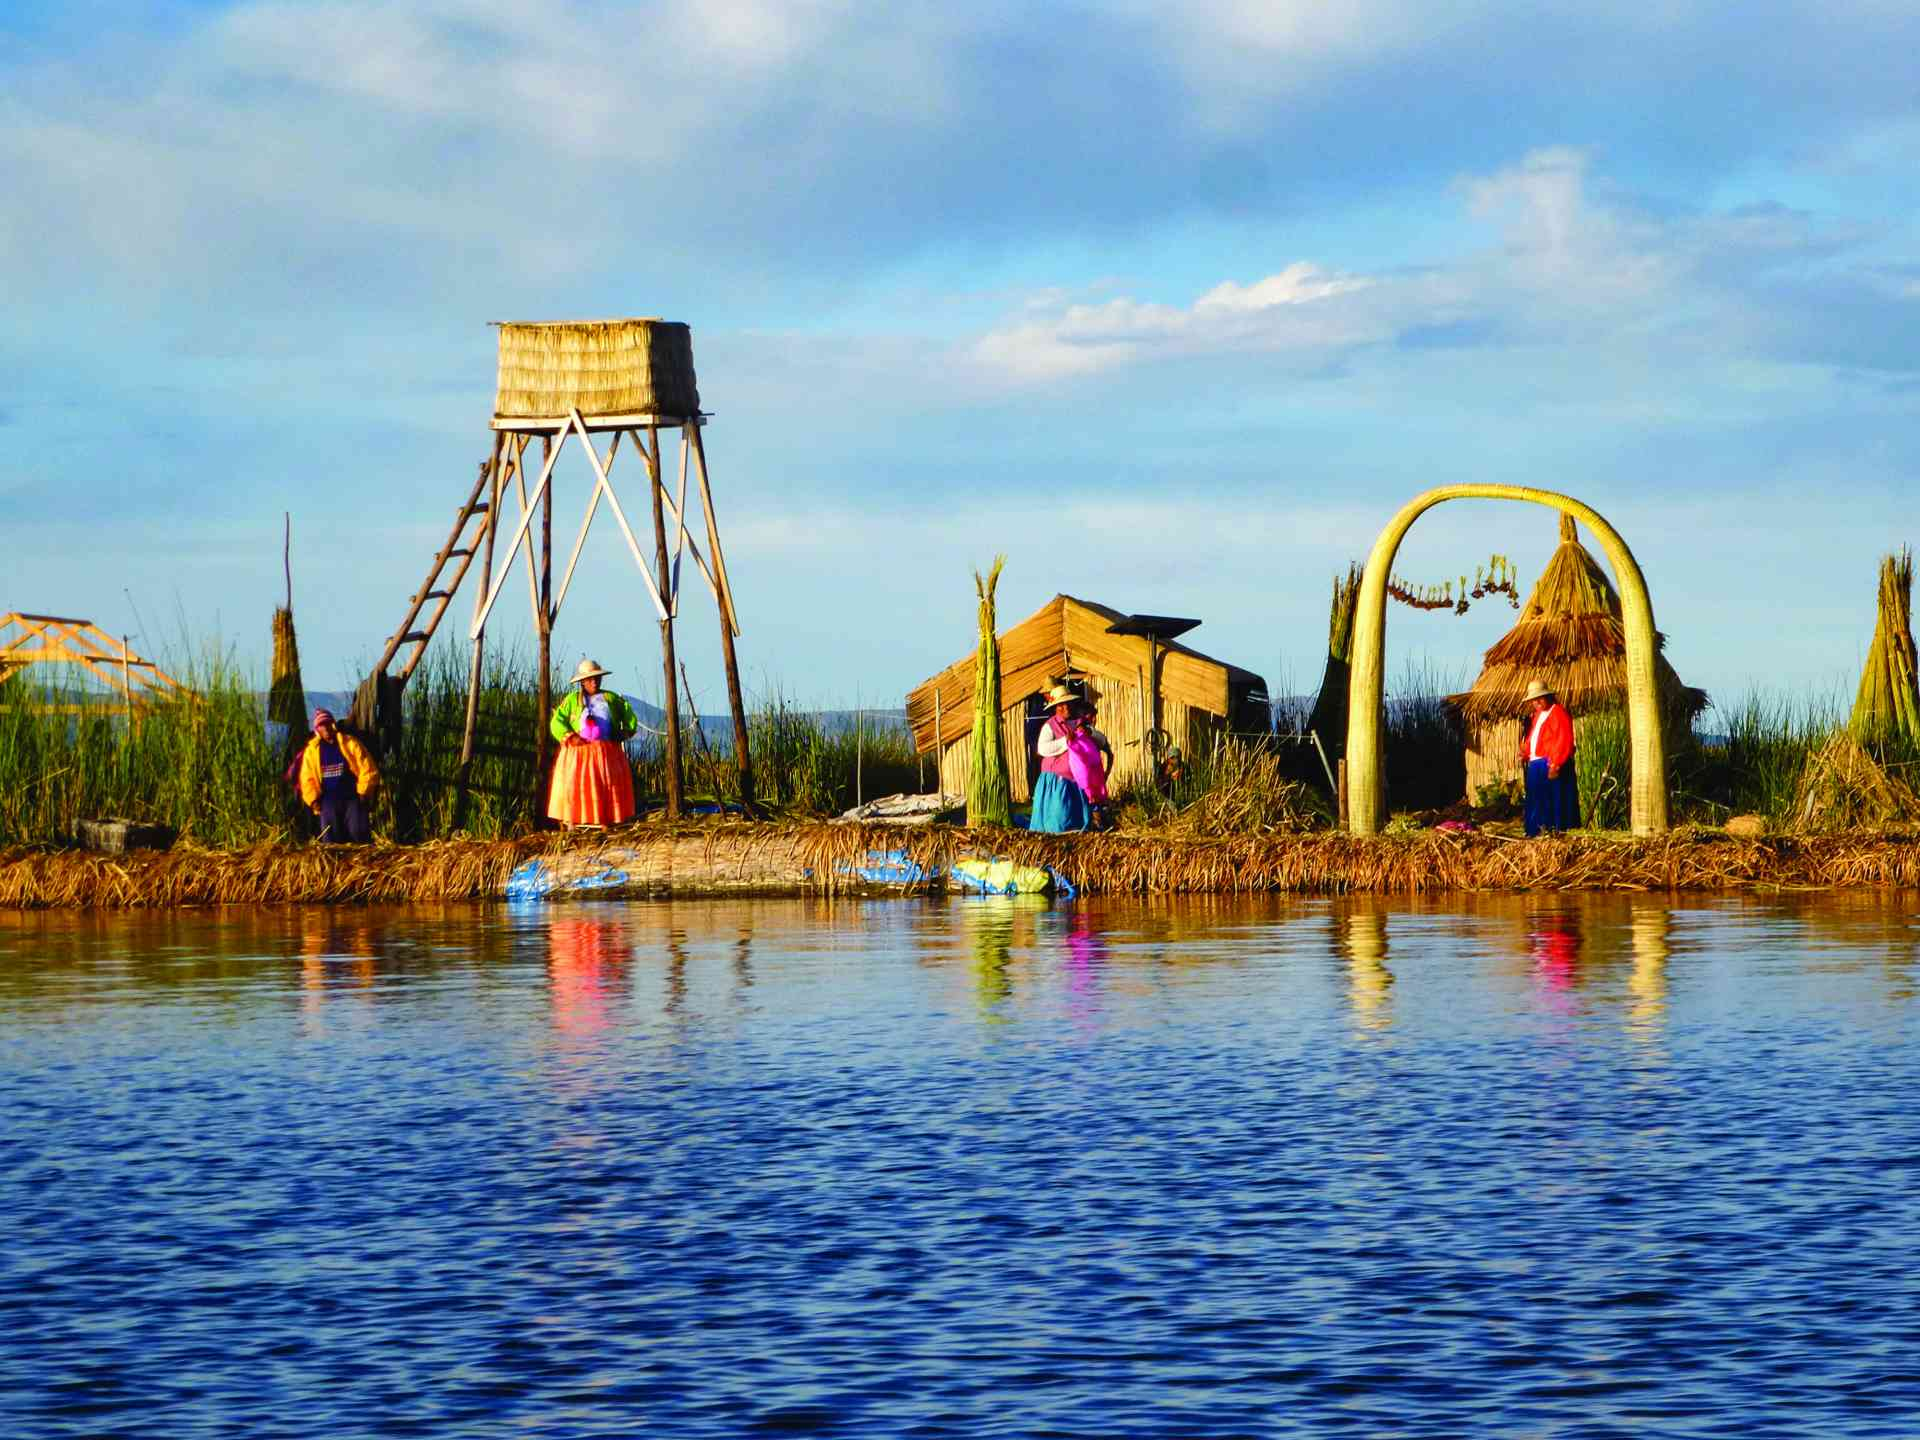 Uros Islands, Lake Titicaca by Marion Bunnik